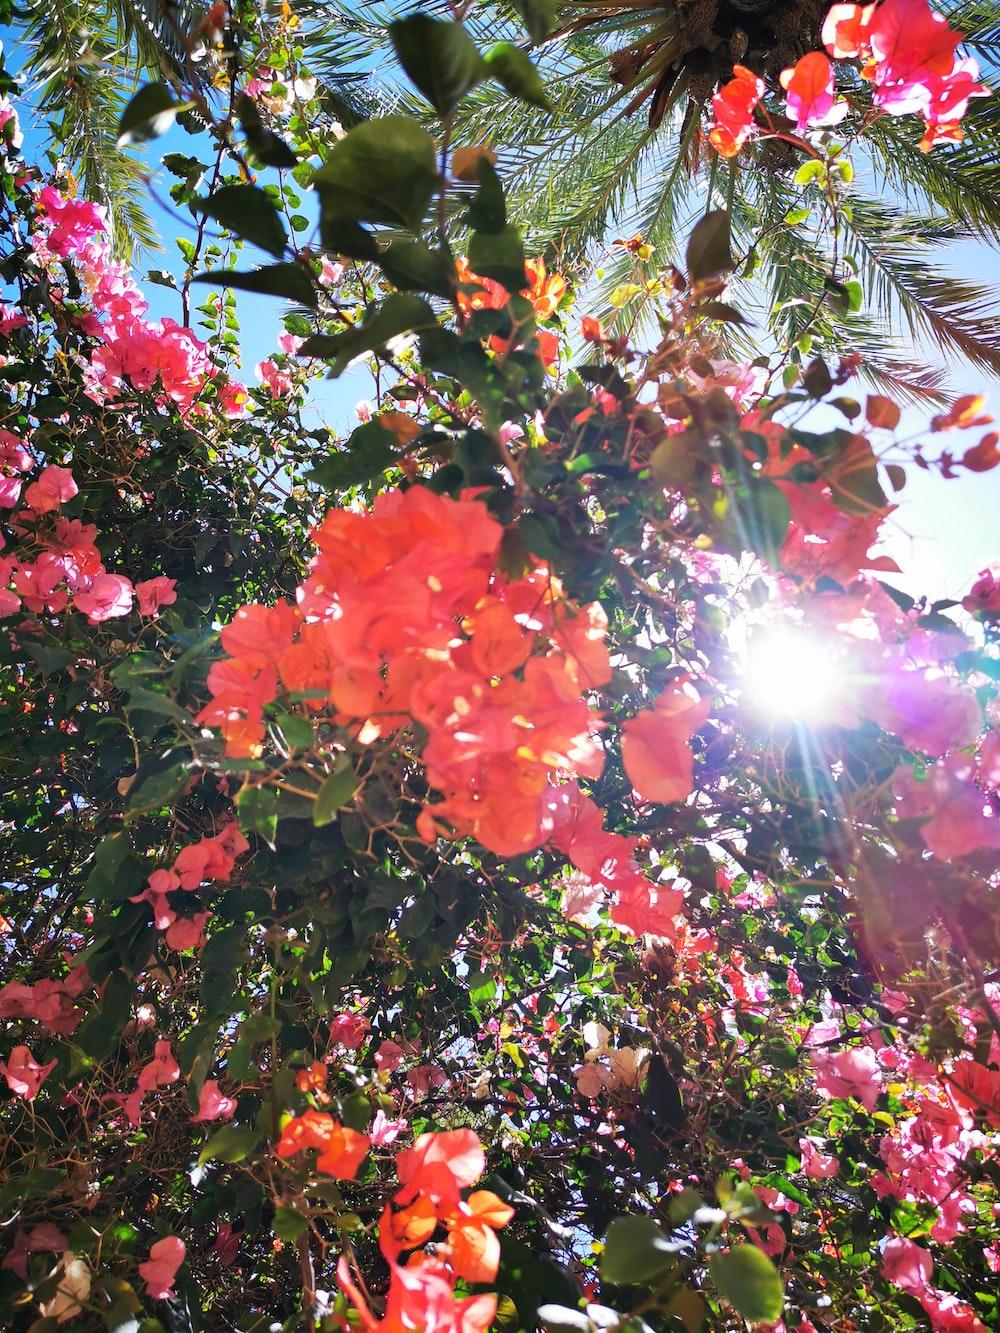 sun rays coming through orange bougainvillea flowers